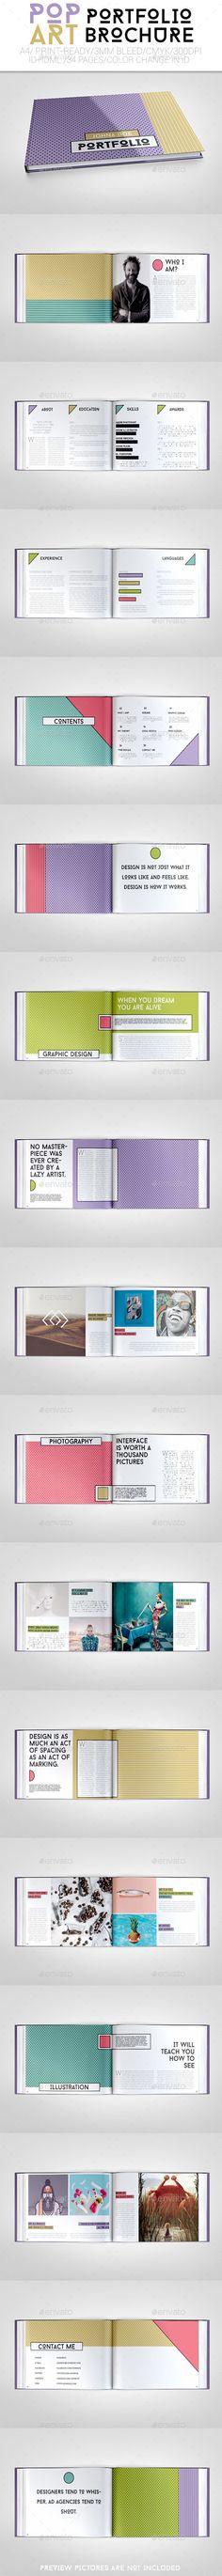 Pop Art Portfolio Brochure #portfolio #brochure #pattern #horizontal #Layout #business #design #art #popart #print #Template #crew55design